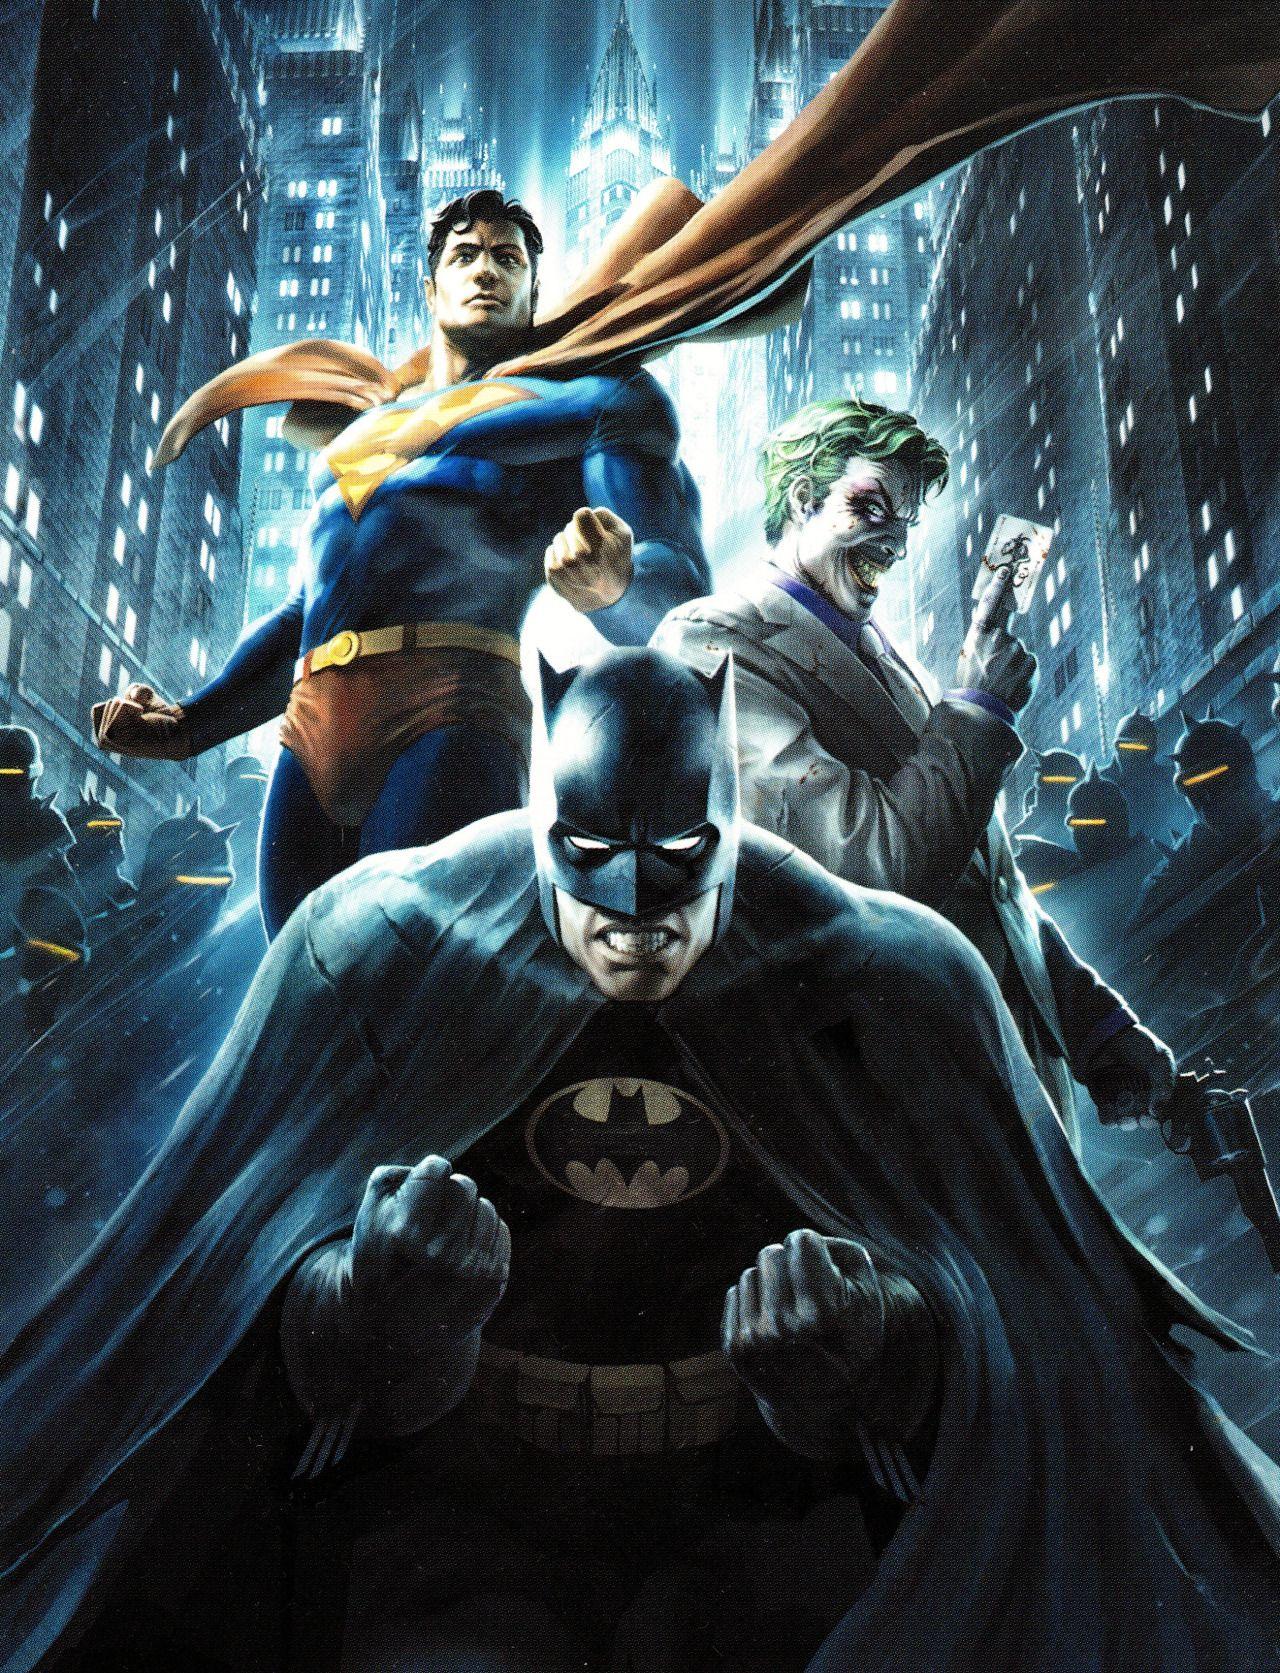 Batman the dark knight returns animated series bonus